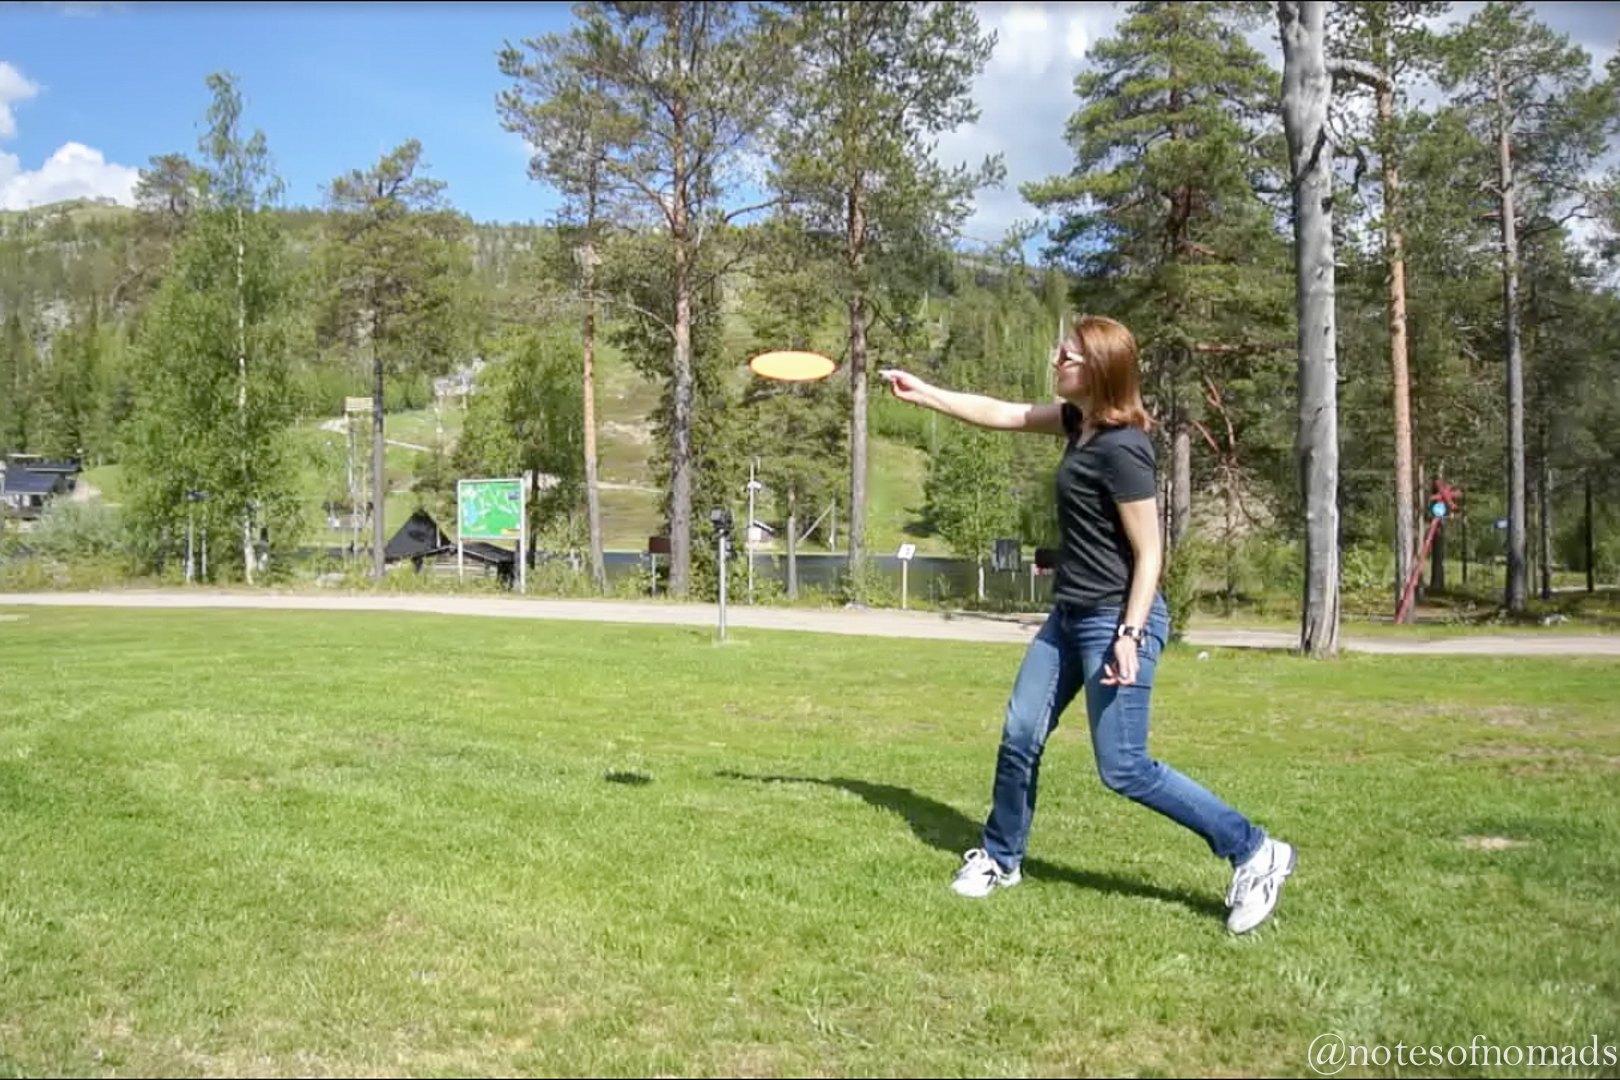 Frisbee golf, Salla, Finland